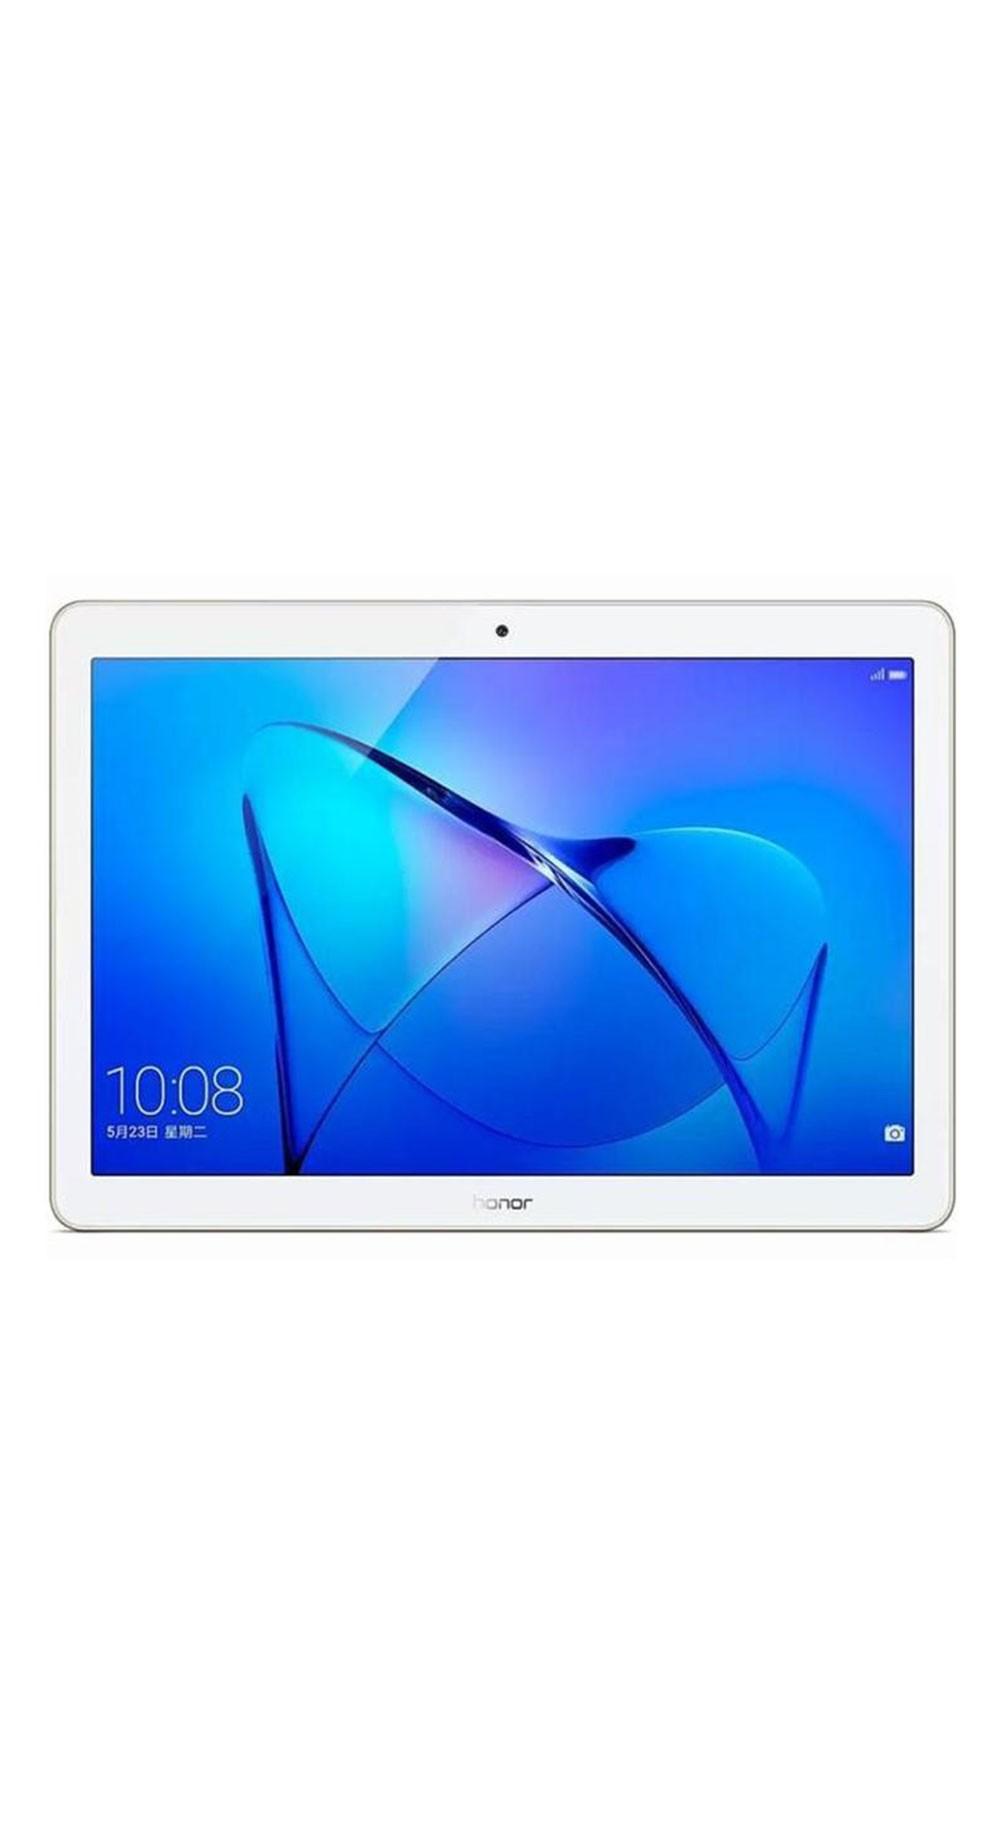 Huawei Tablet t3 10